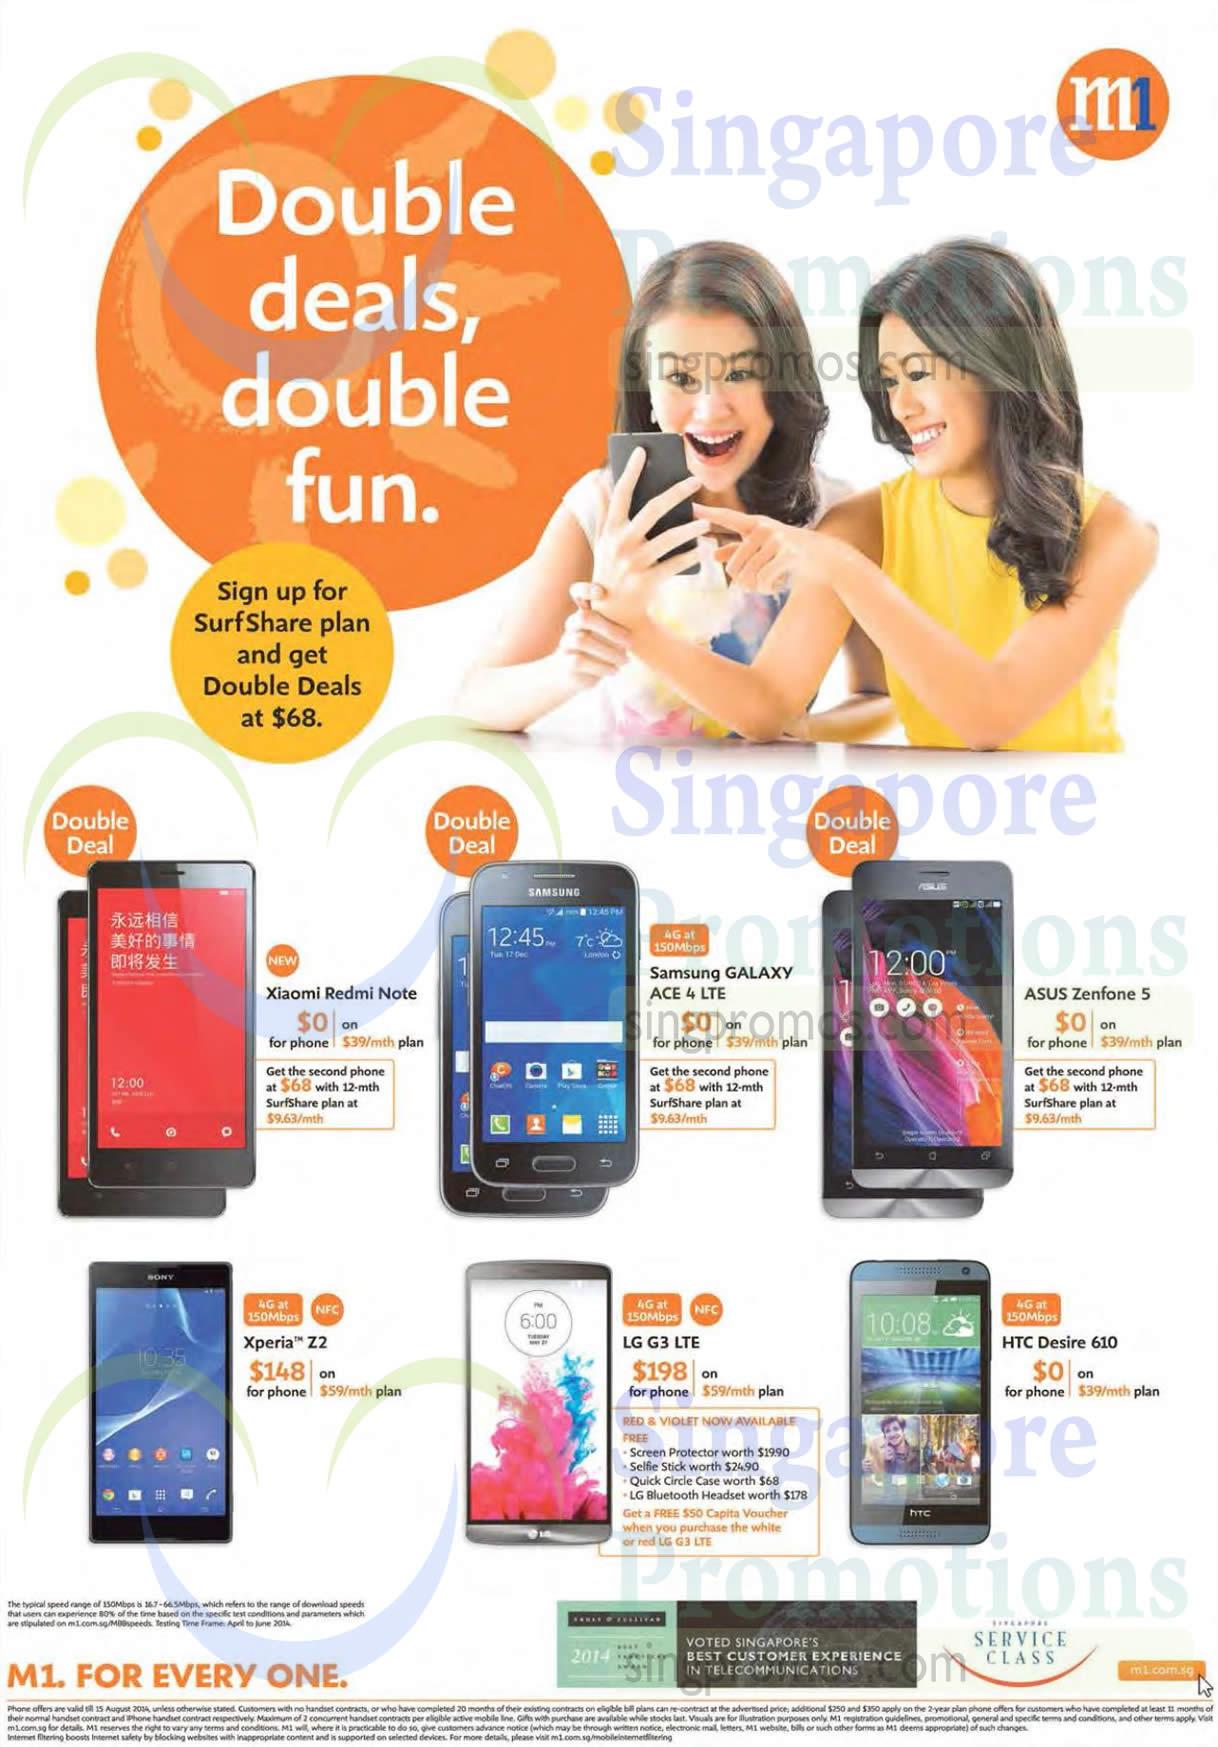 Xiaomi Redmi Note, Samsung Galaxy Ace 4, Asus Zenfone 5, Sony Xperia Z2, Lg G3, HTC Desire 610, Surfshare Plan Double Deals